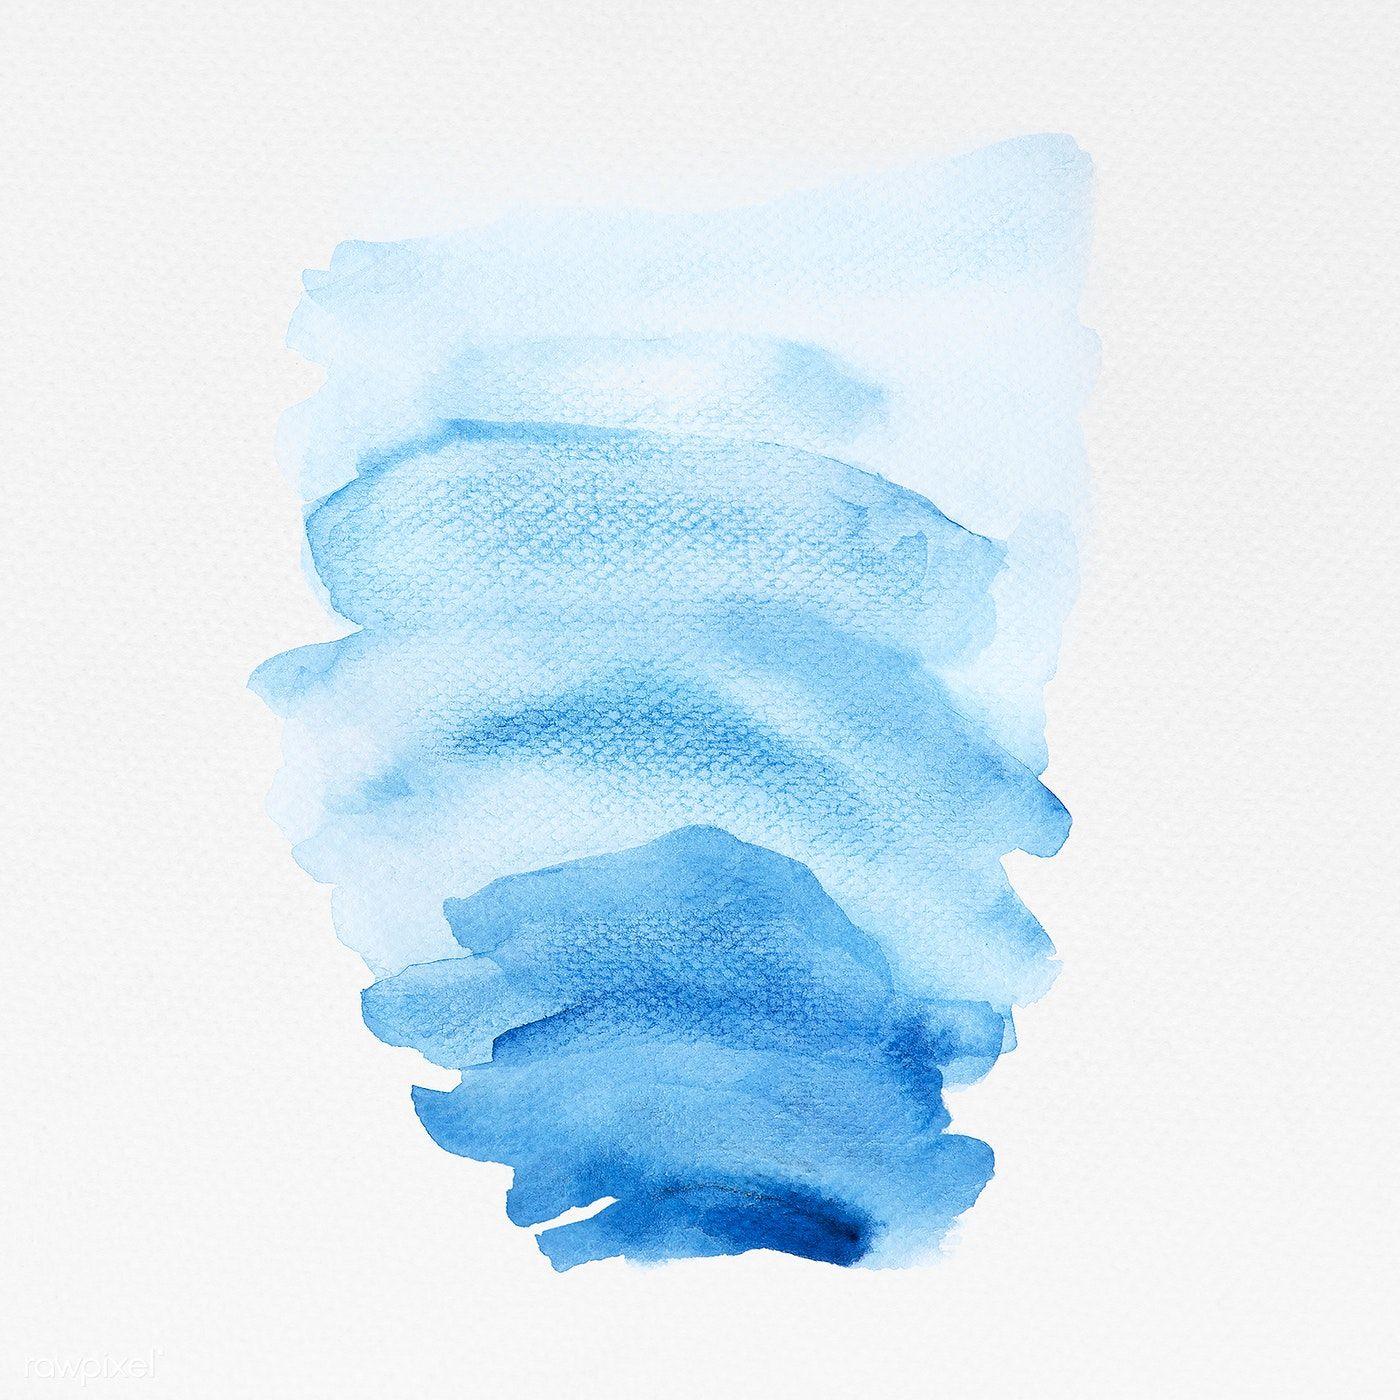 Download Premium Illustration Of Shades Of Blue Watercolor Brush Strokes Watercolor Splash Png Blue Watercolor Watercolor Brushes